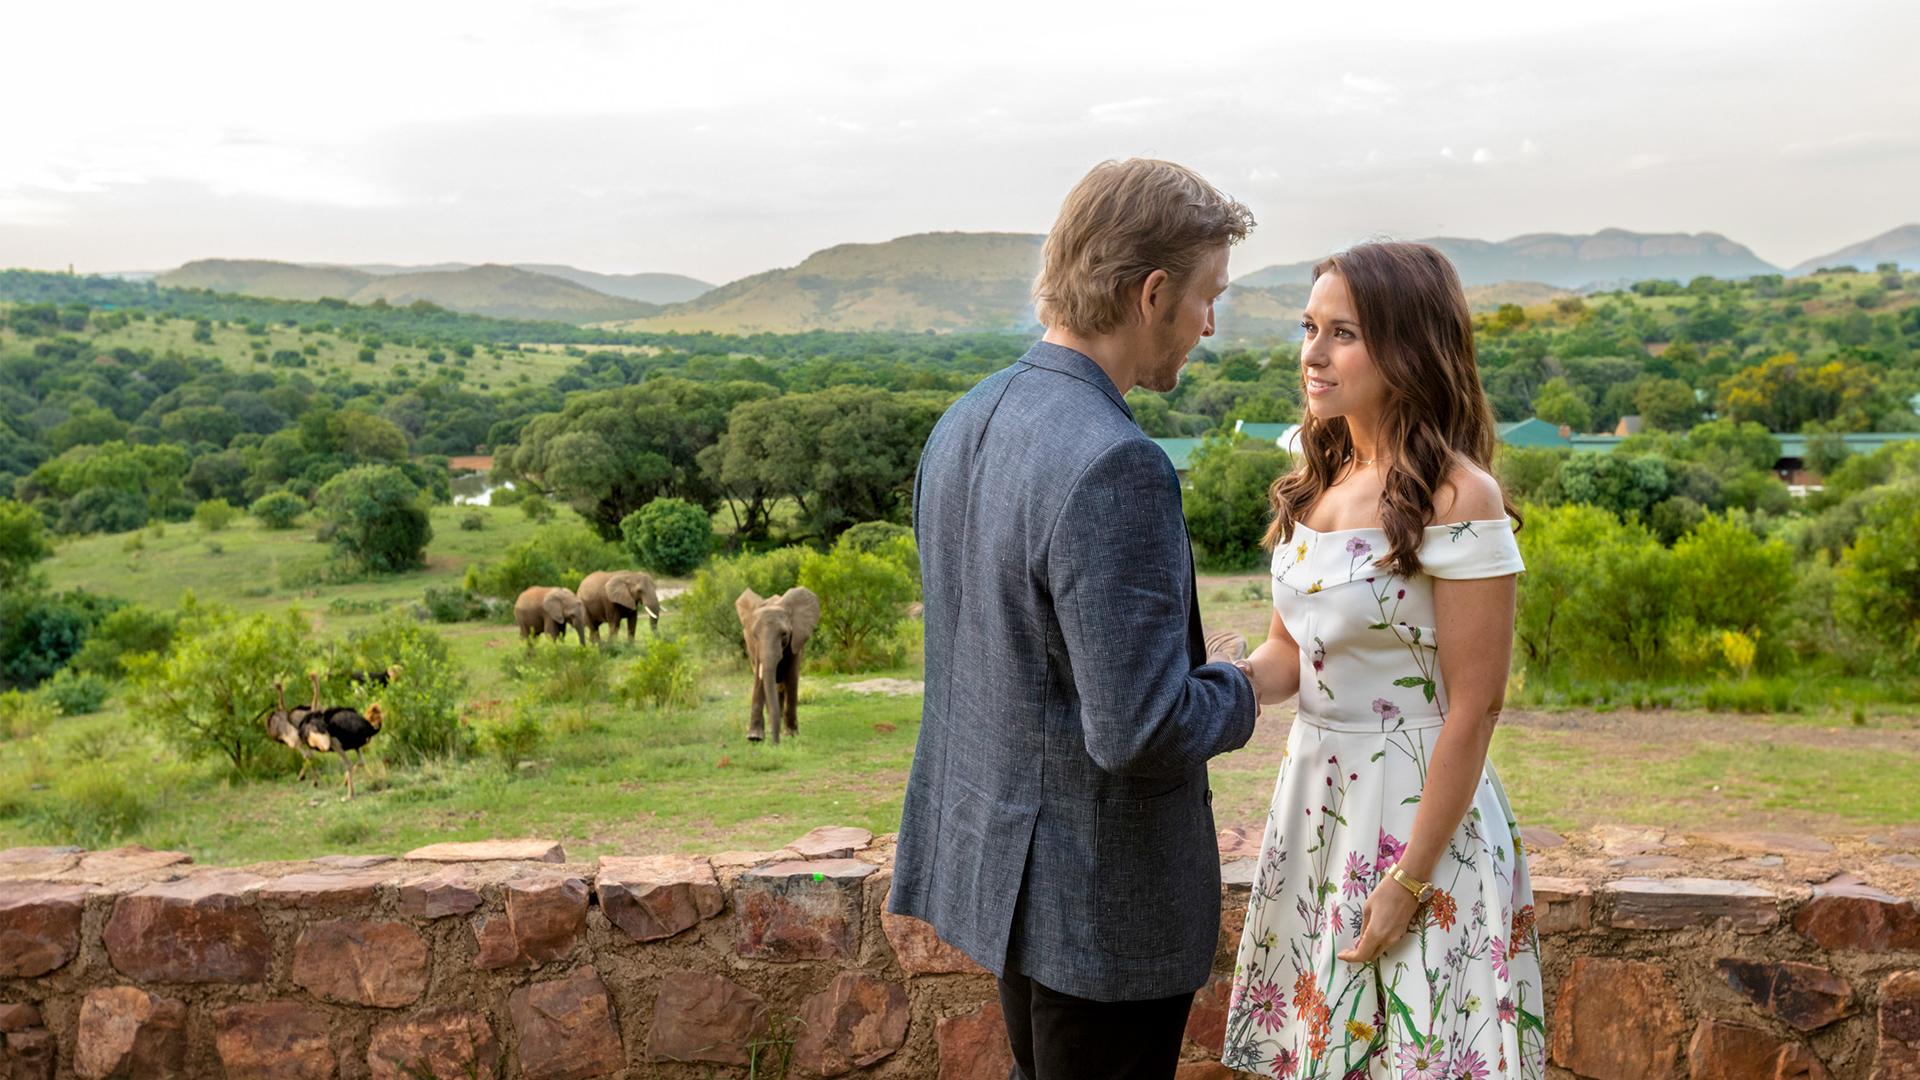 Love on Safari on Amazon Prime Video UK